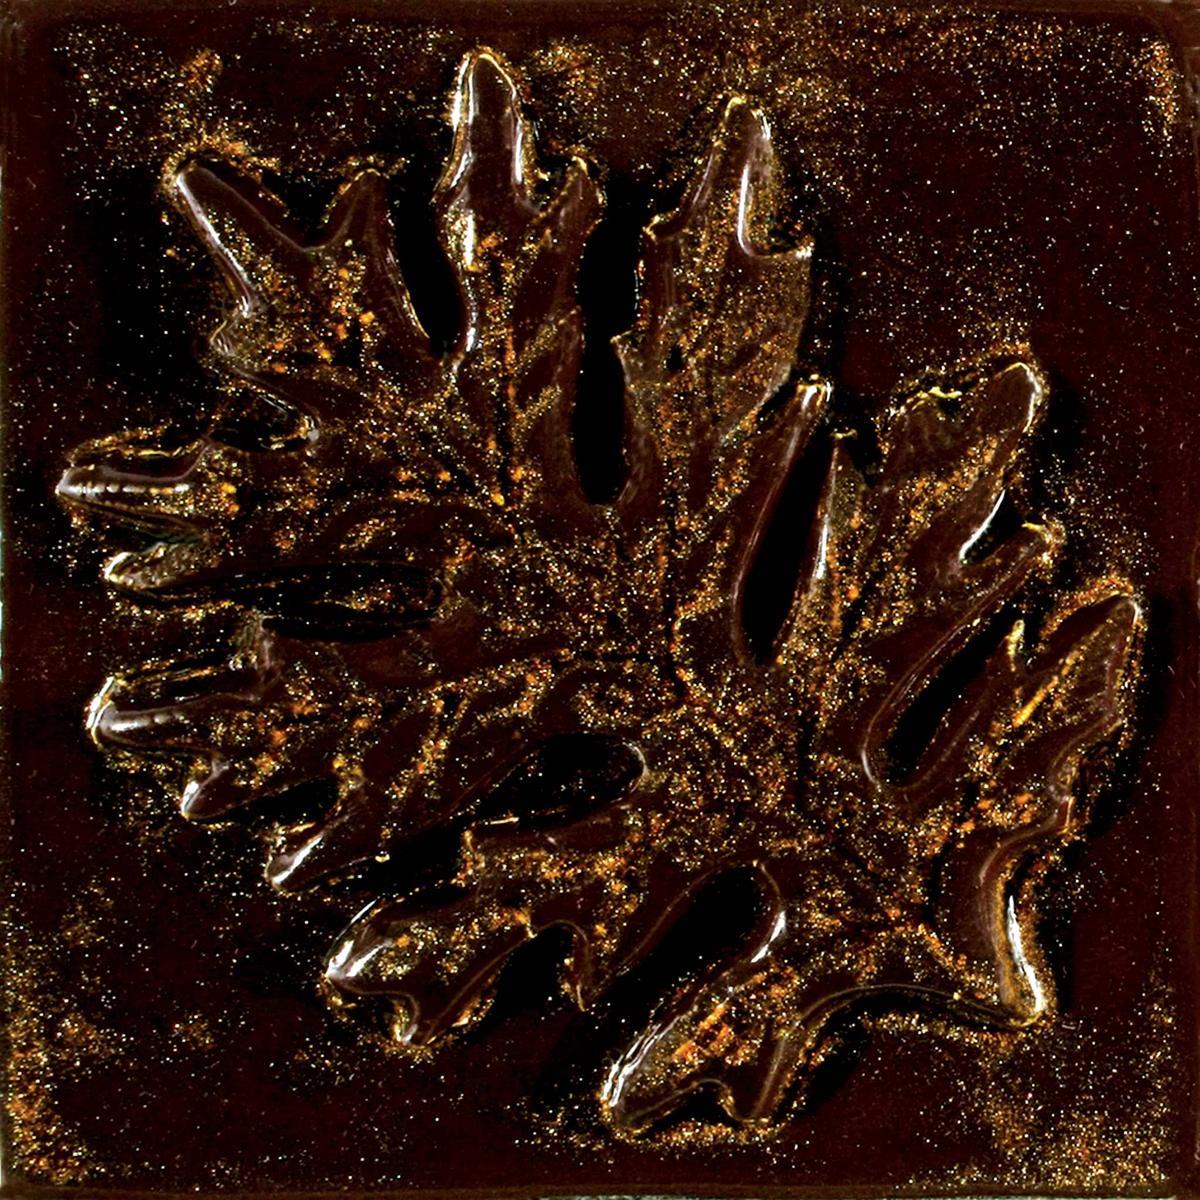 venta de esmalte para cerámica amaco textured alligator Lt-132 jewel brown baja temperatura